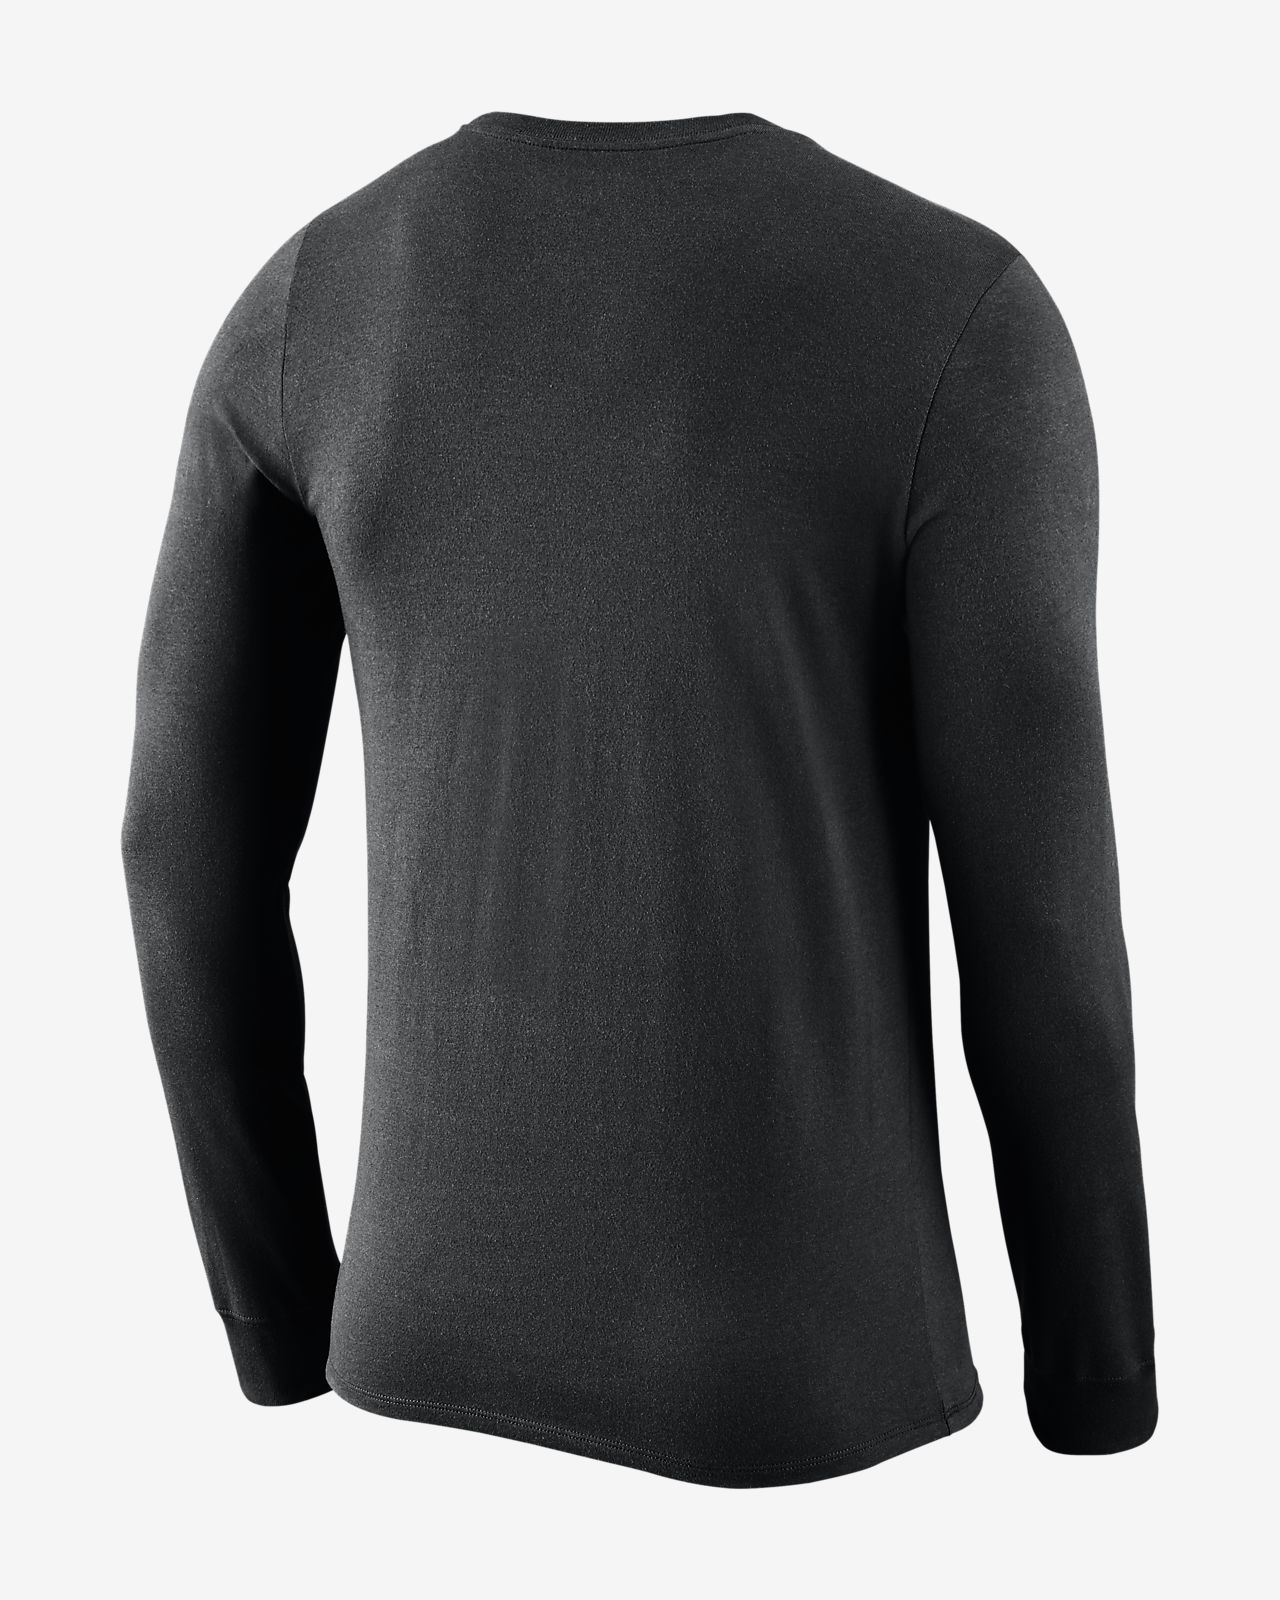 27898918 Nike Dri-FIT Seismic (NFL Steelers) Men's Long-Sleeve T-Shirt. Nike.com